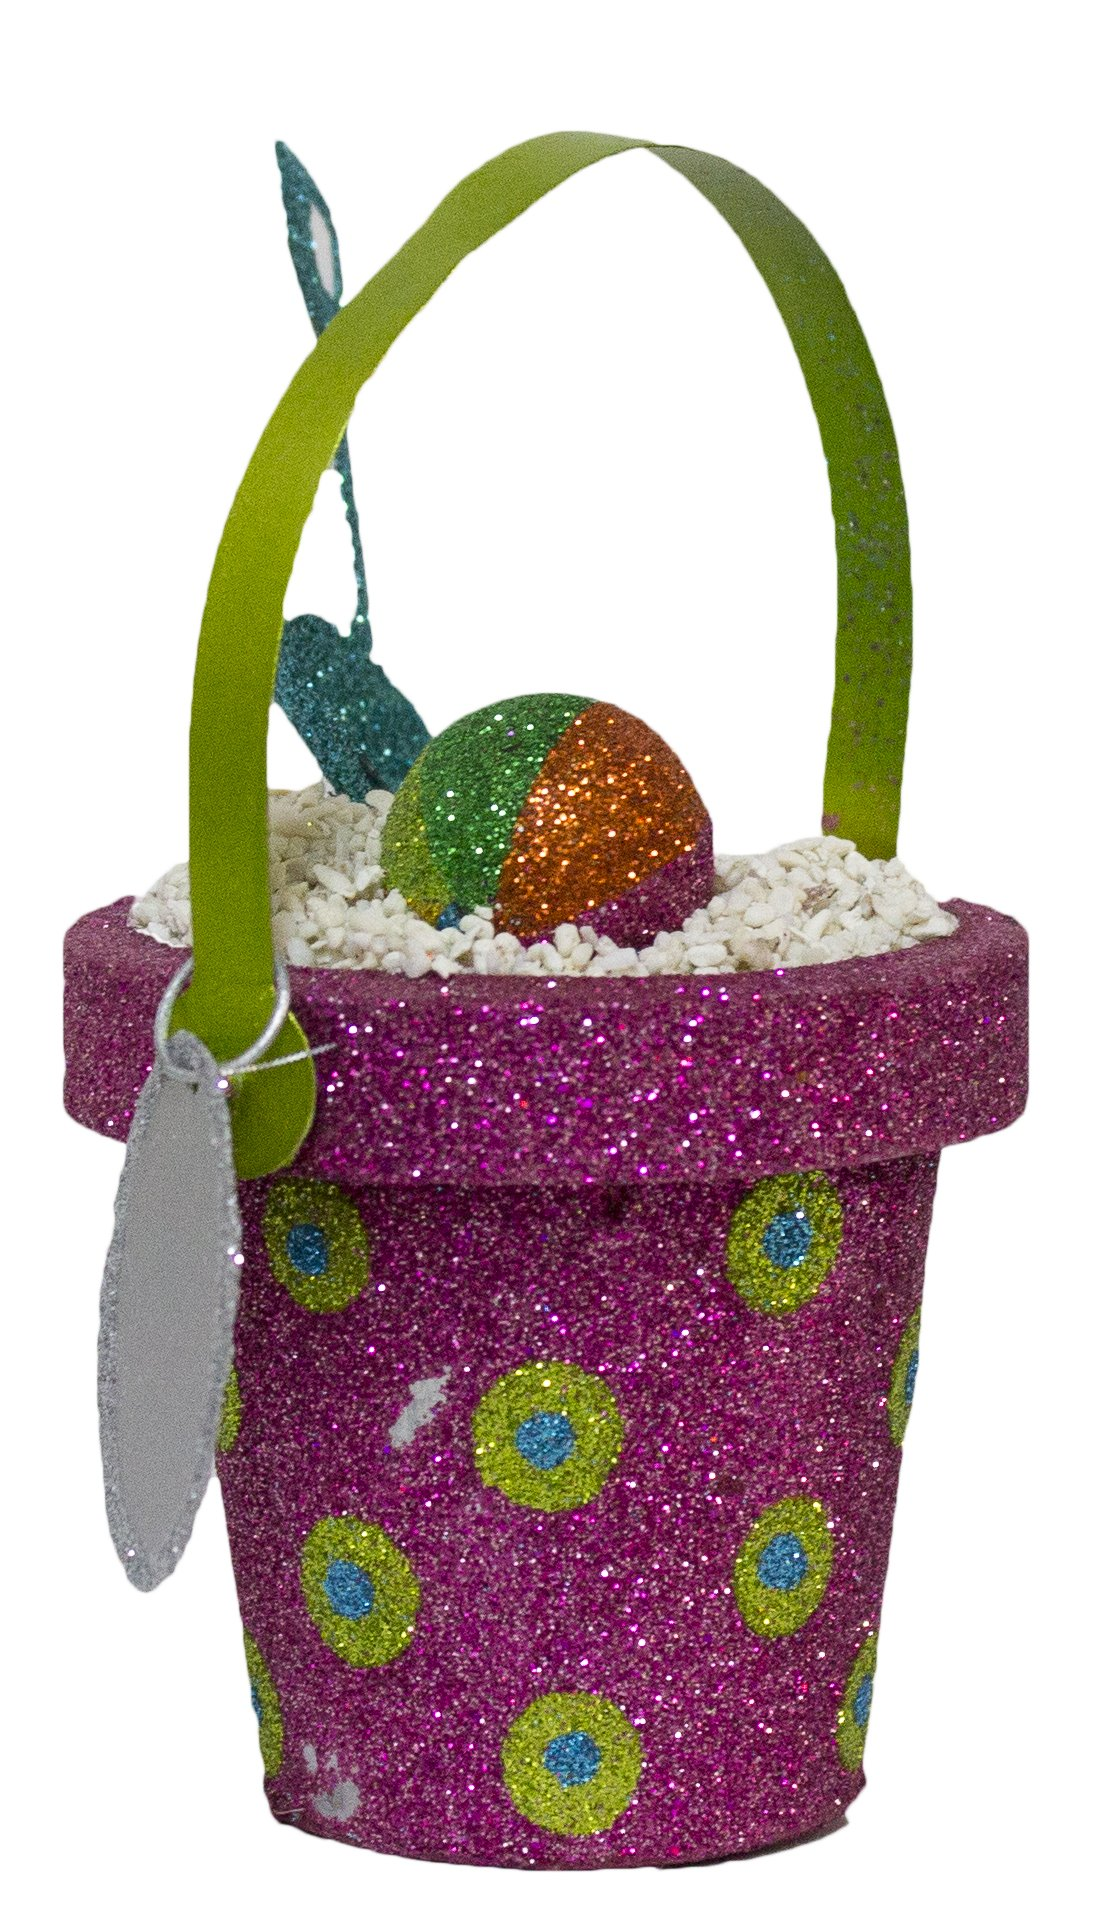 Sand Pail and Shovel Glitter Christmas/ Everyday Ornament